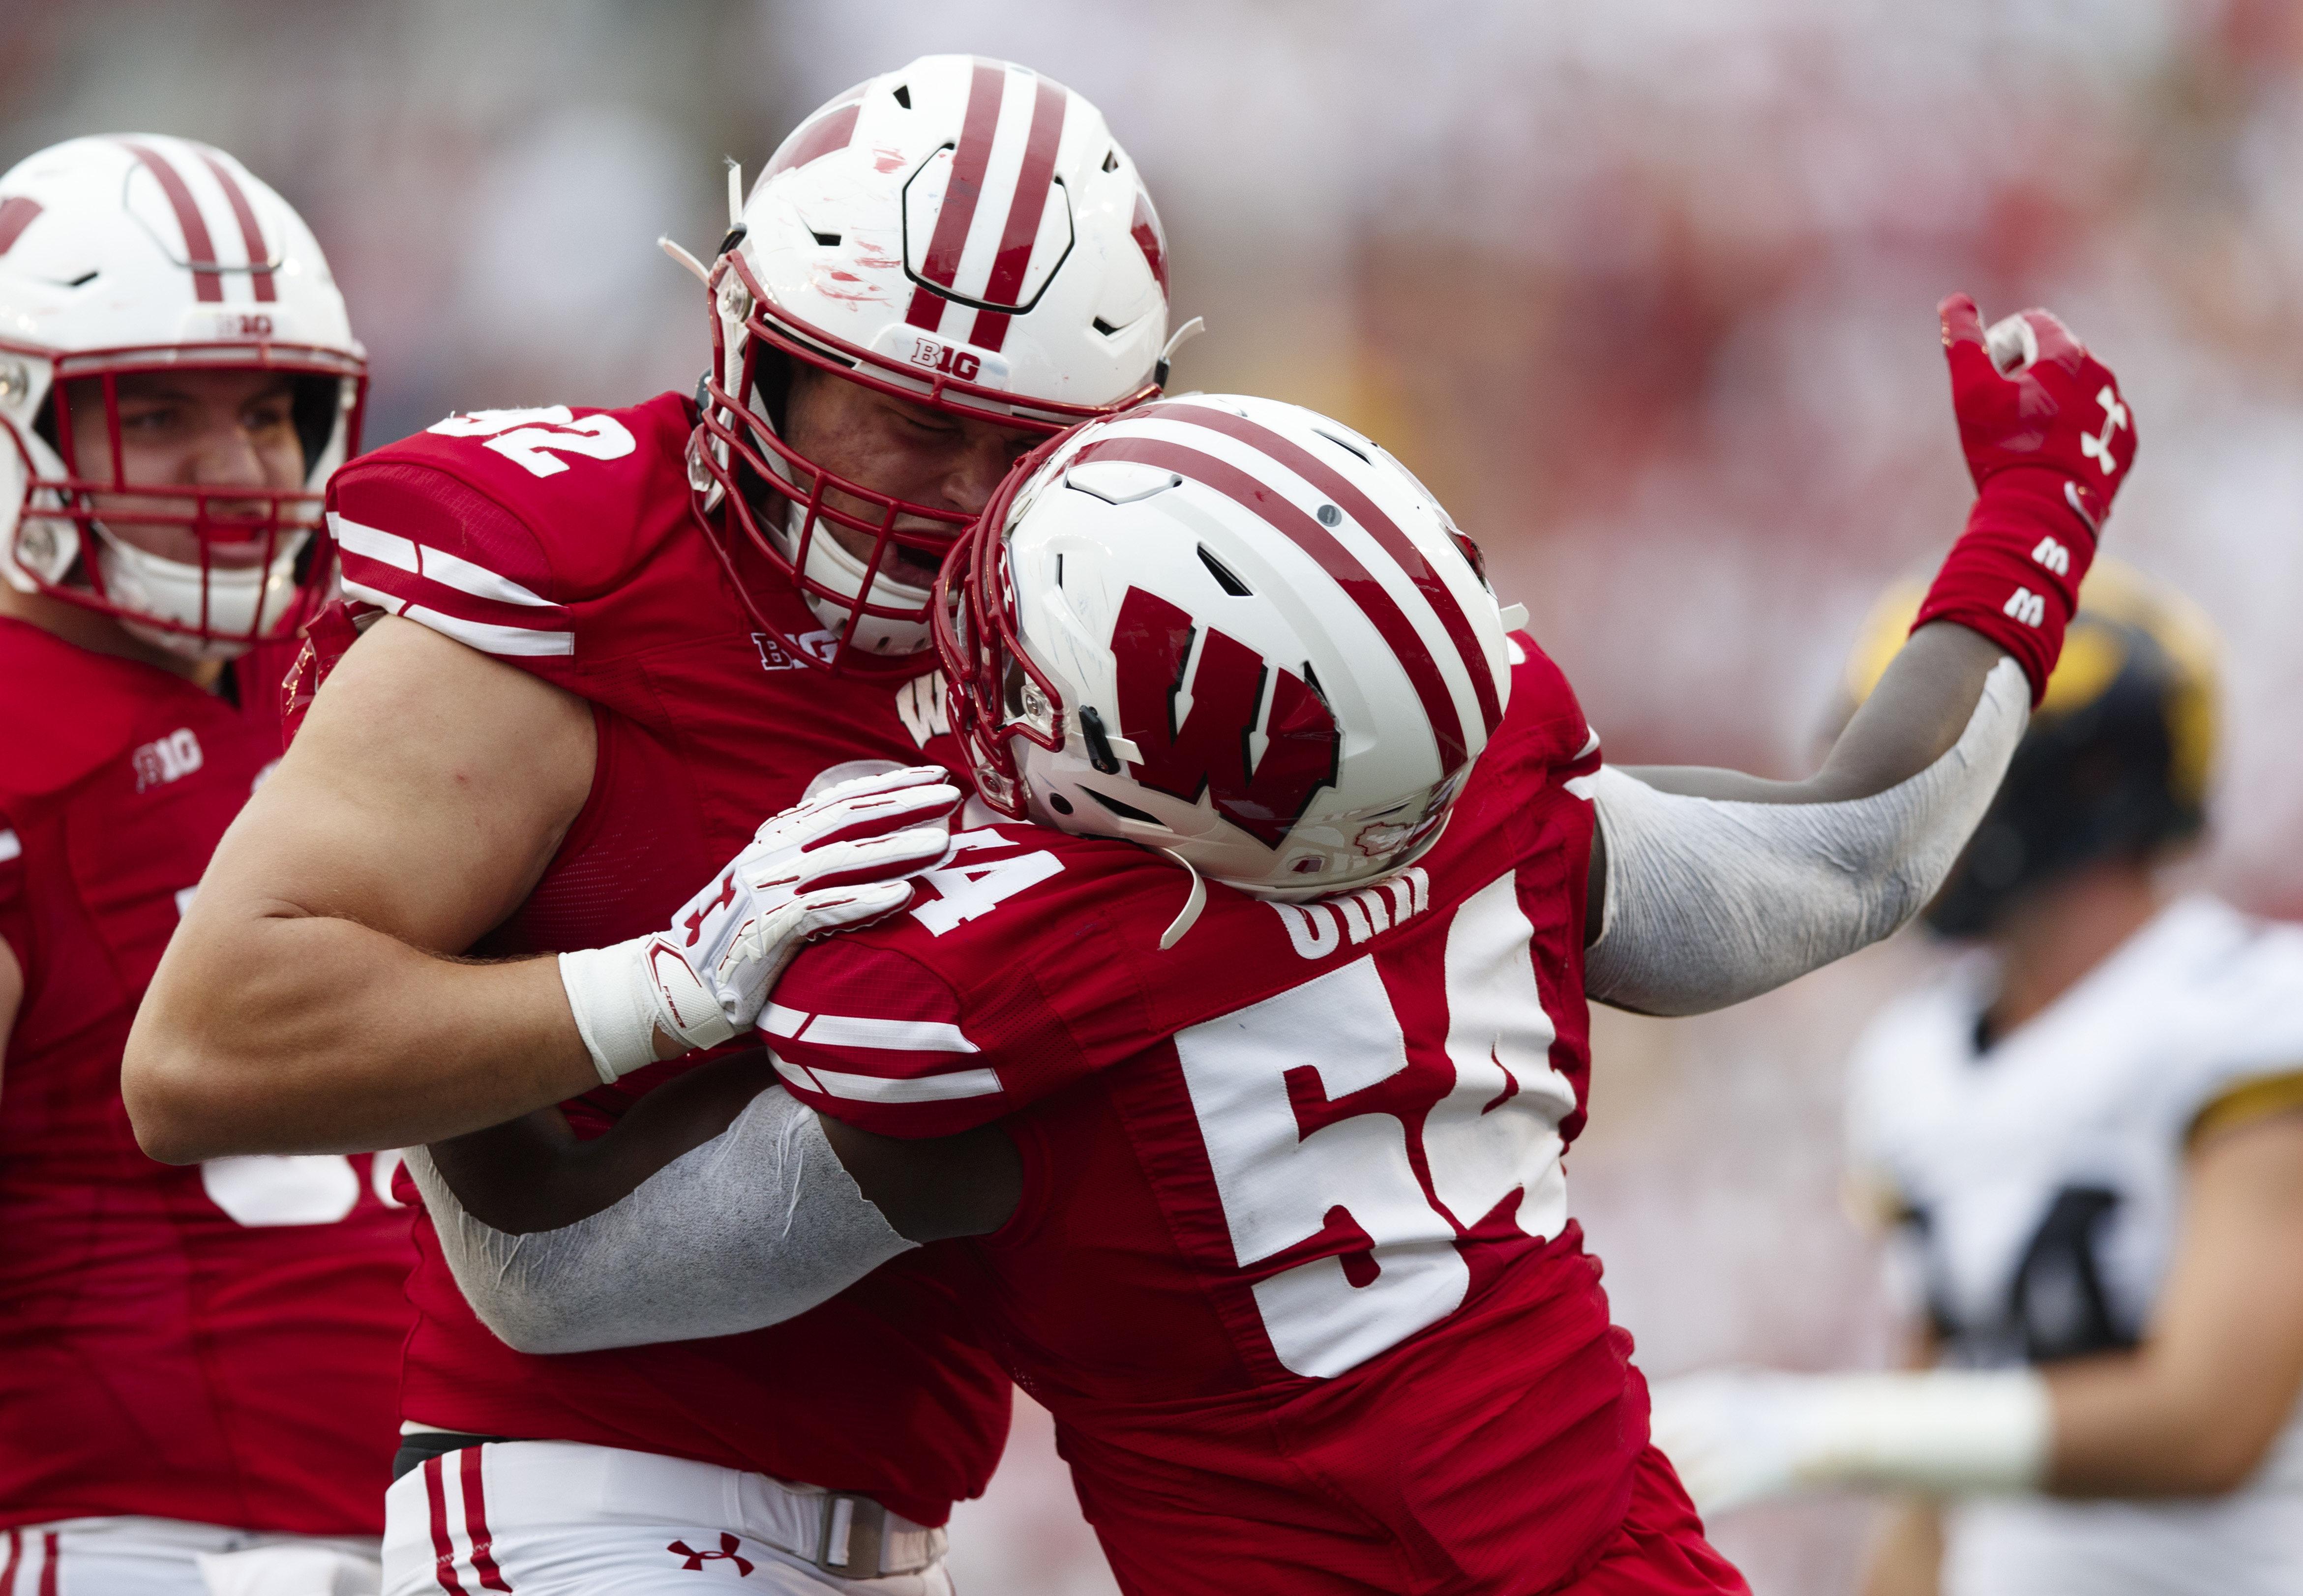 Wisconsin LB Chris Orr earns prestigious national recognition for big game vs MSU